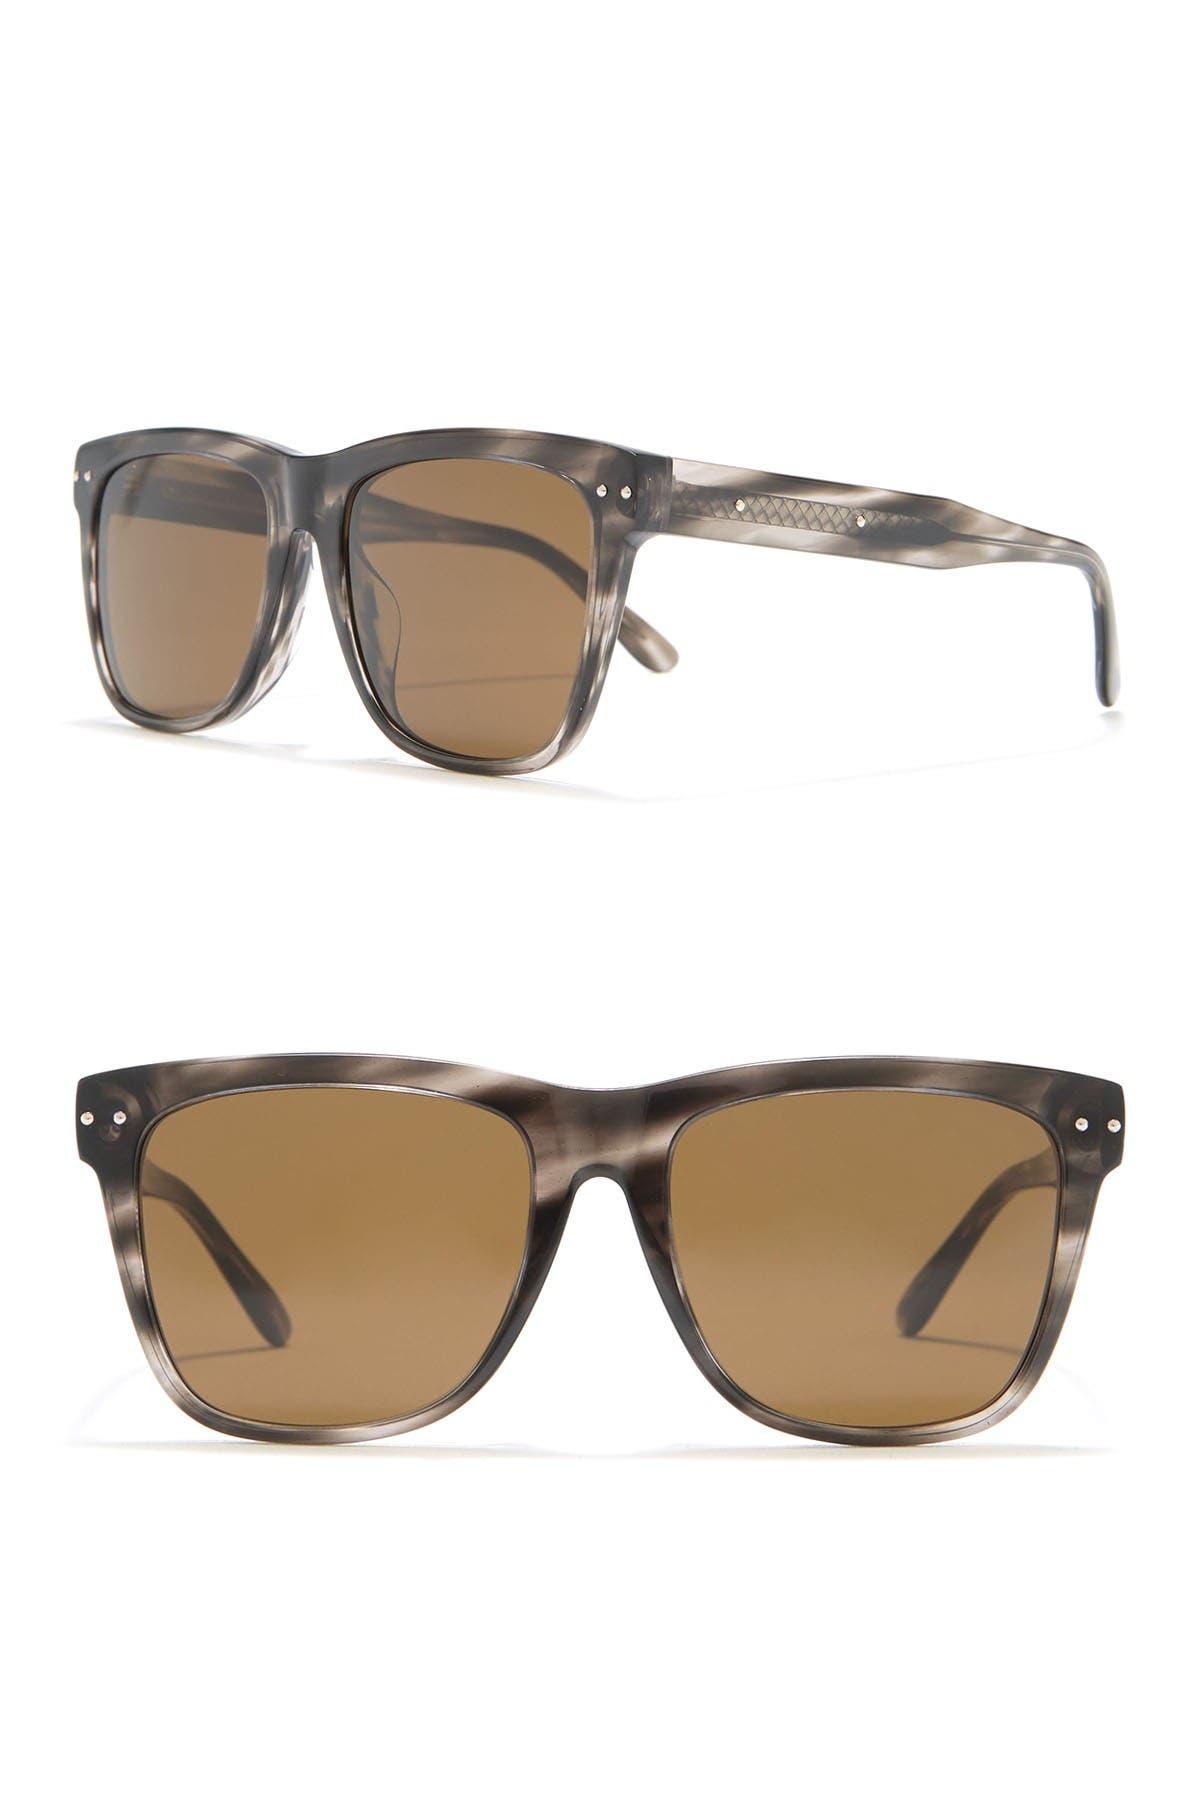 Image of Bottega Veneta Core Rectangle 55mm Sunglasses